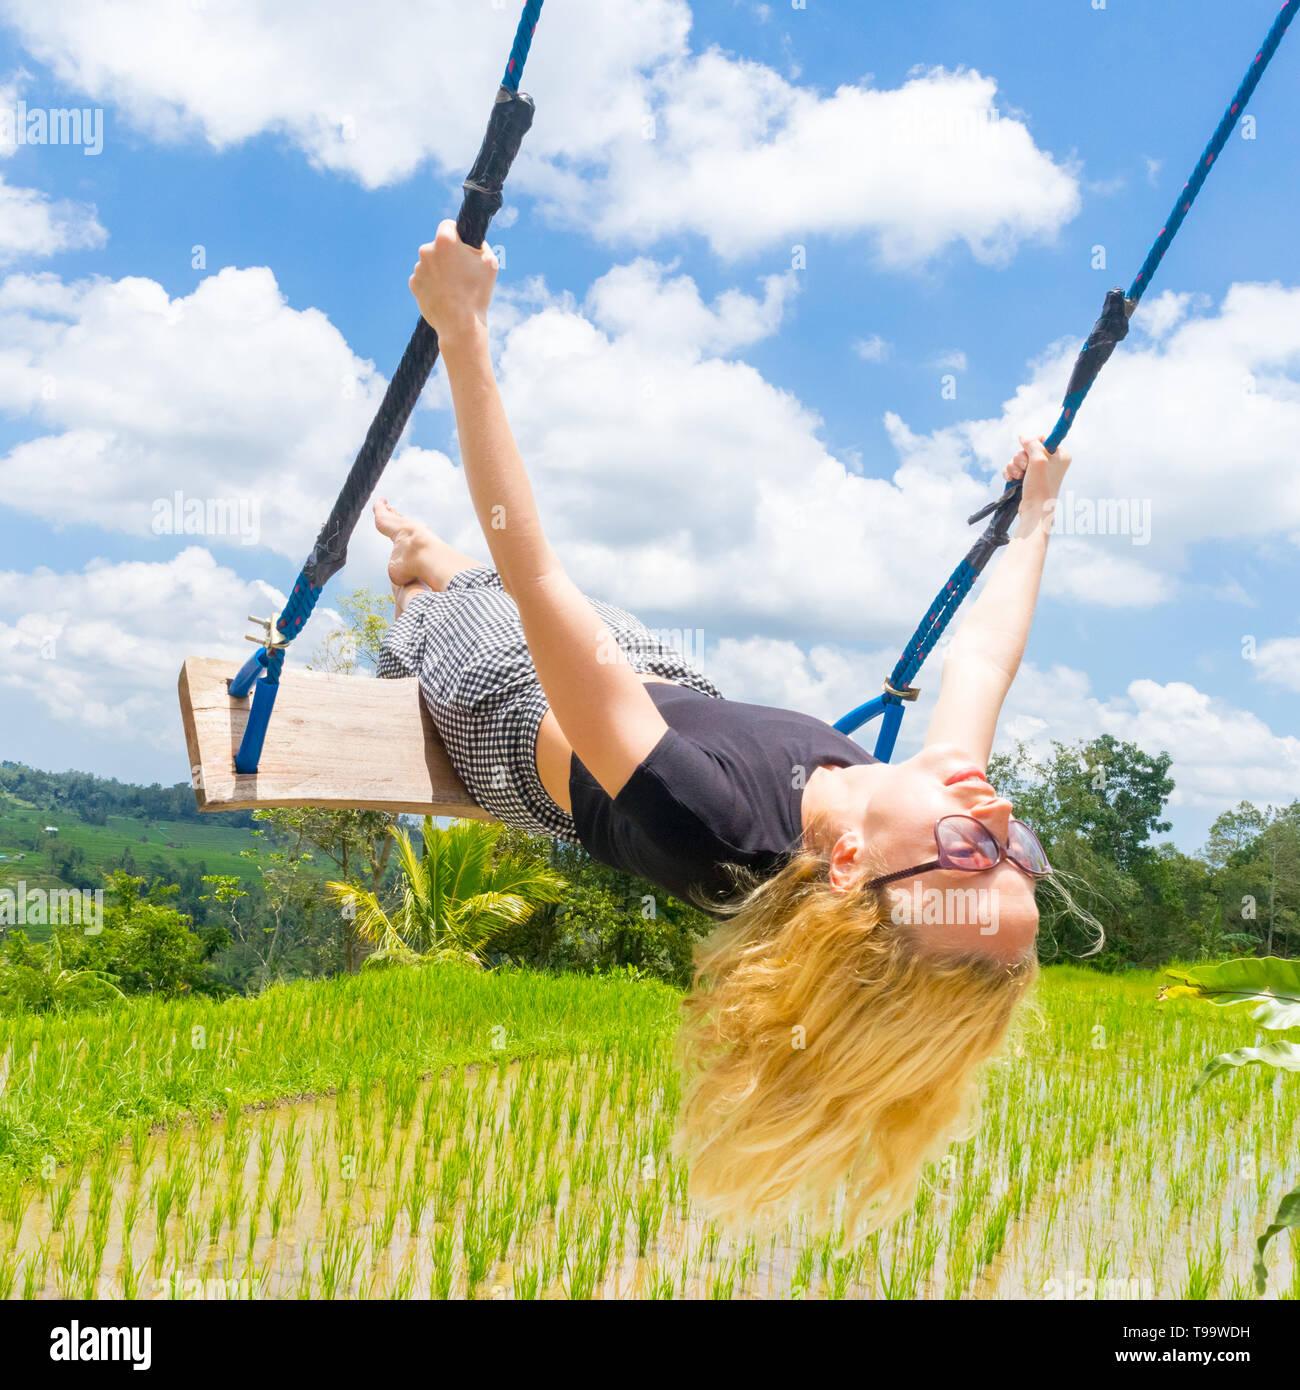 Happy female traveller swinging on wooden swing, enjoying summer vacation among pristine green rice terraces. - Stock Image